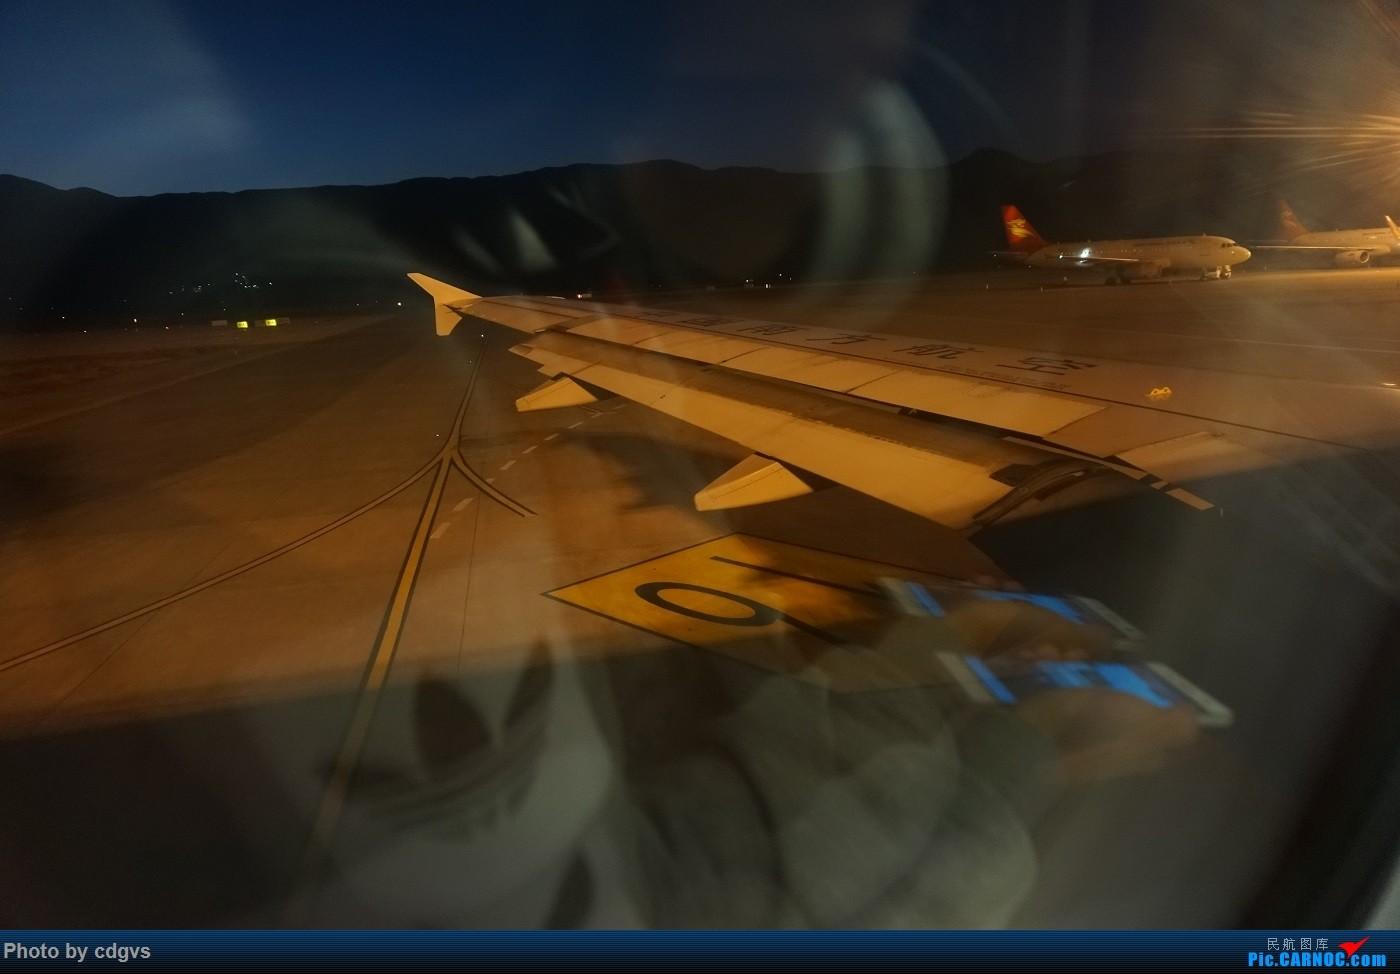 Re:[原创]KMG-LJG-KMG 东航&南航 省内刷航段,飞空客波音两种不同机型     空乘